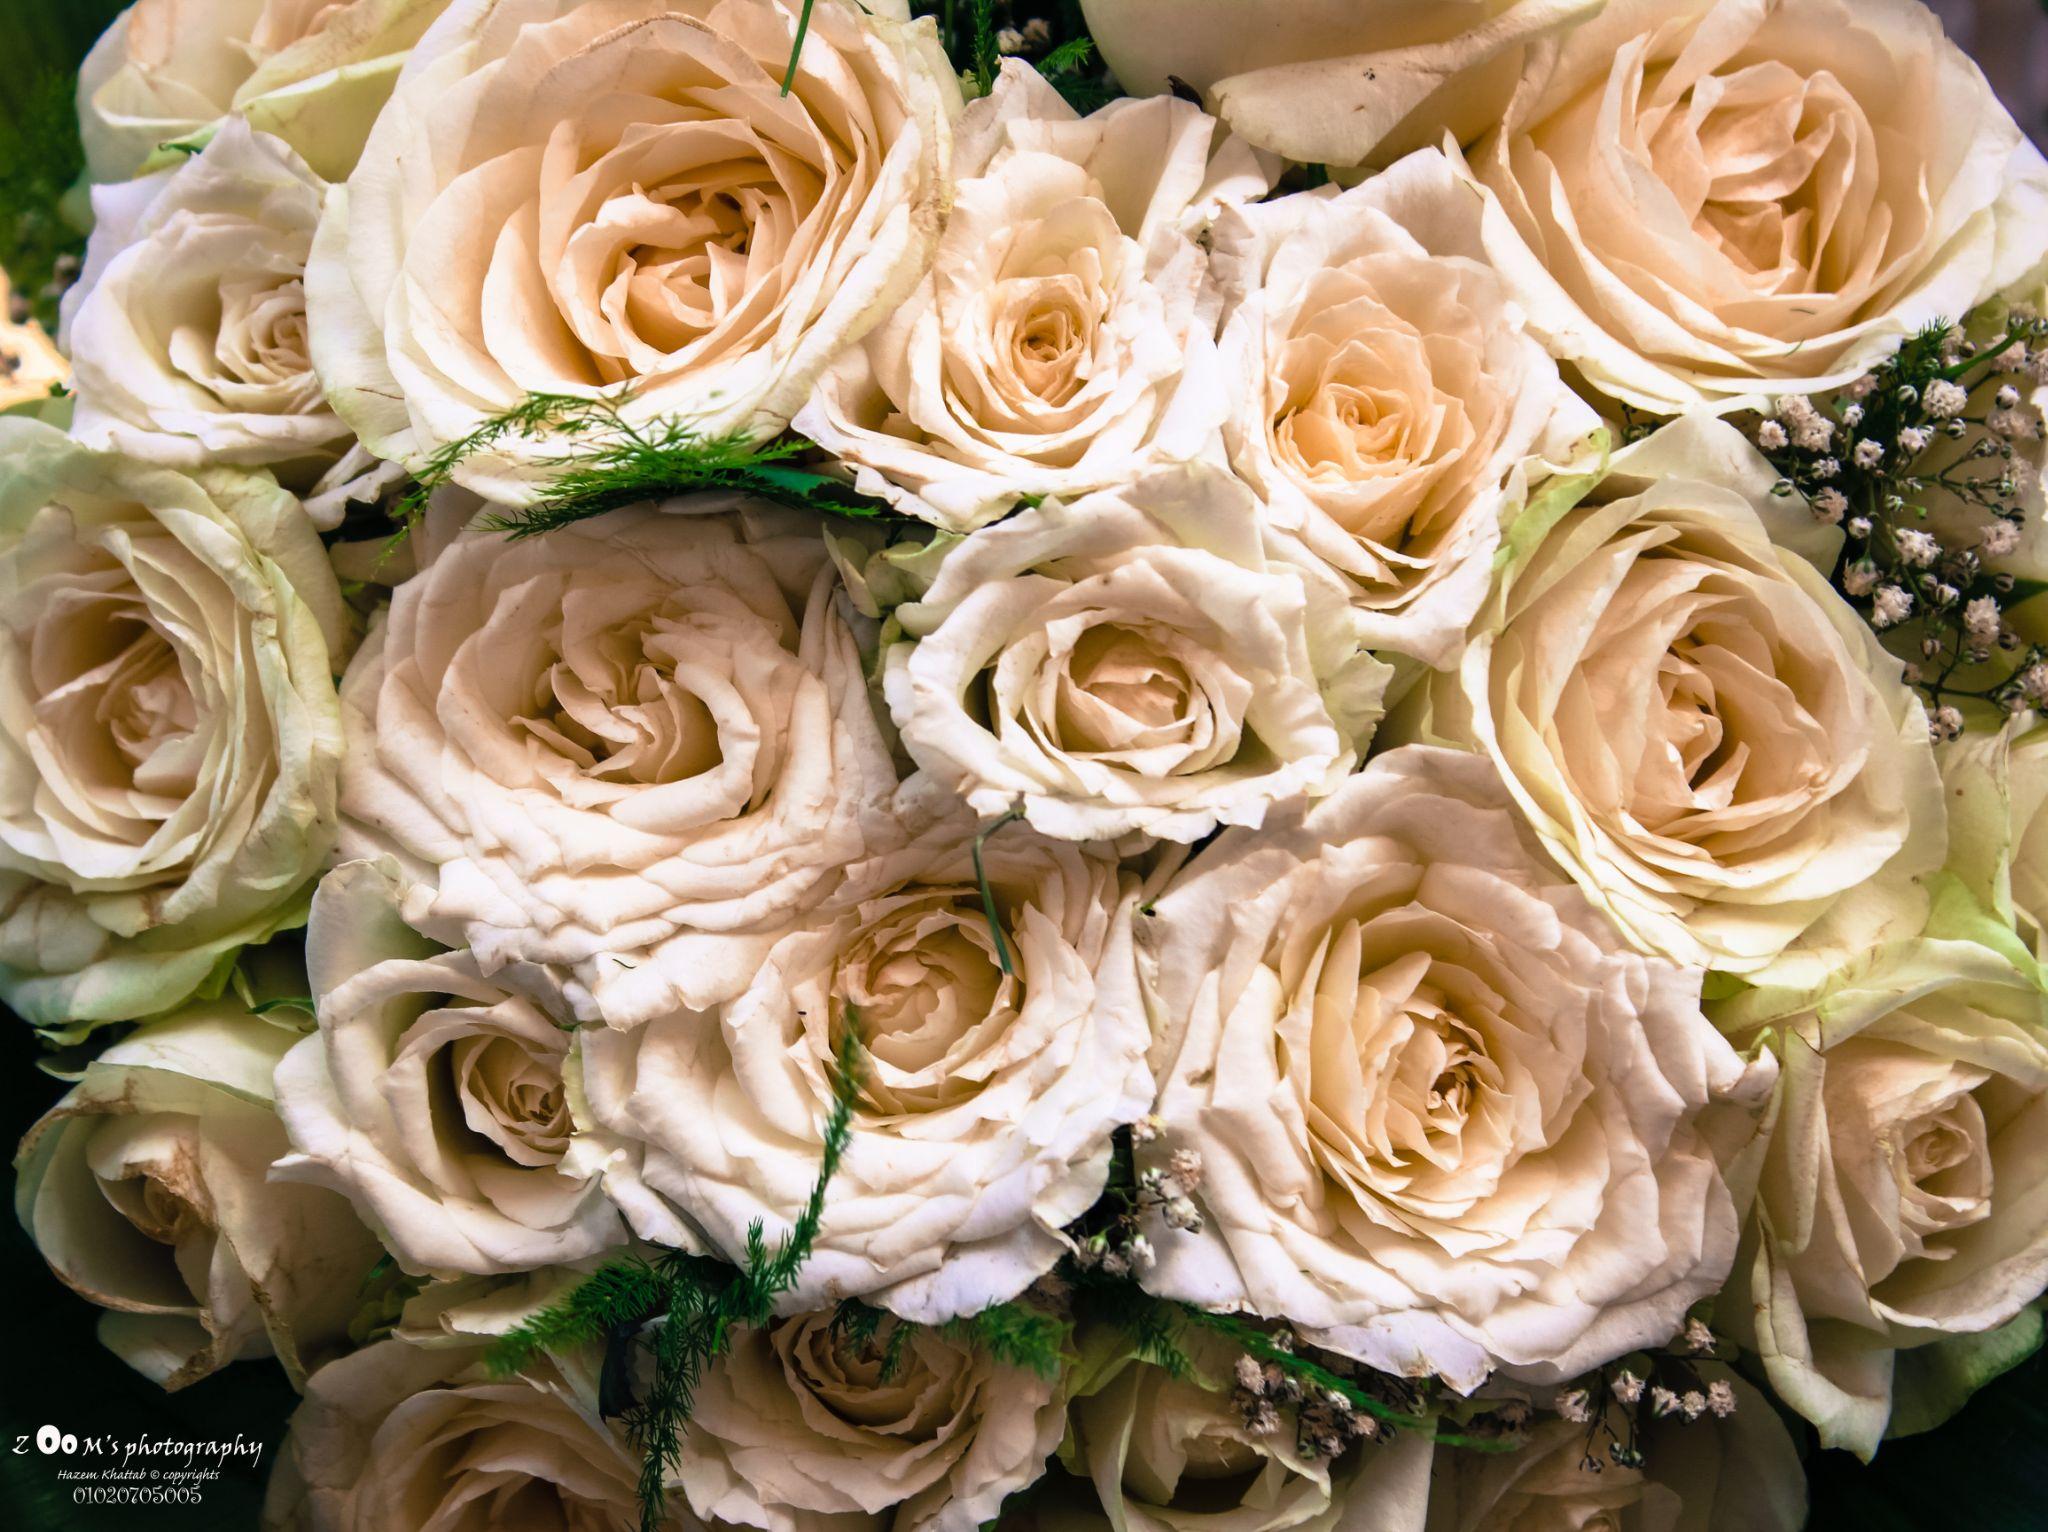 roses by Hazem_Khattab